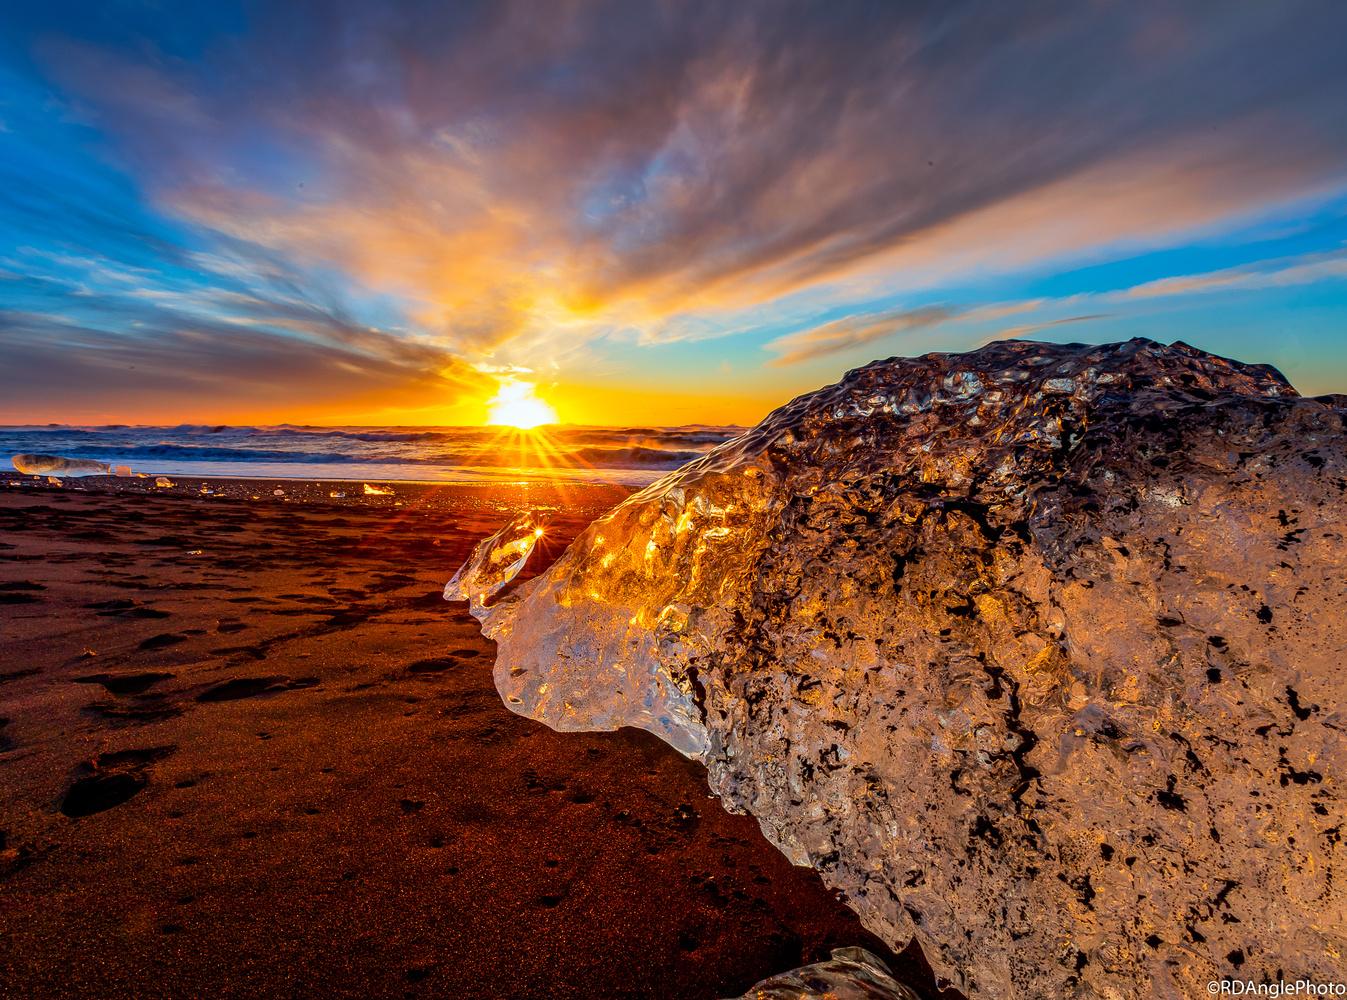 Diamond Beach by Richard Angle